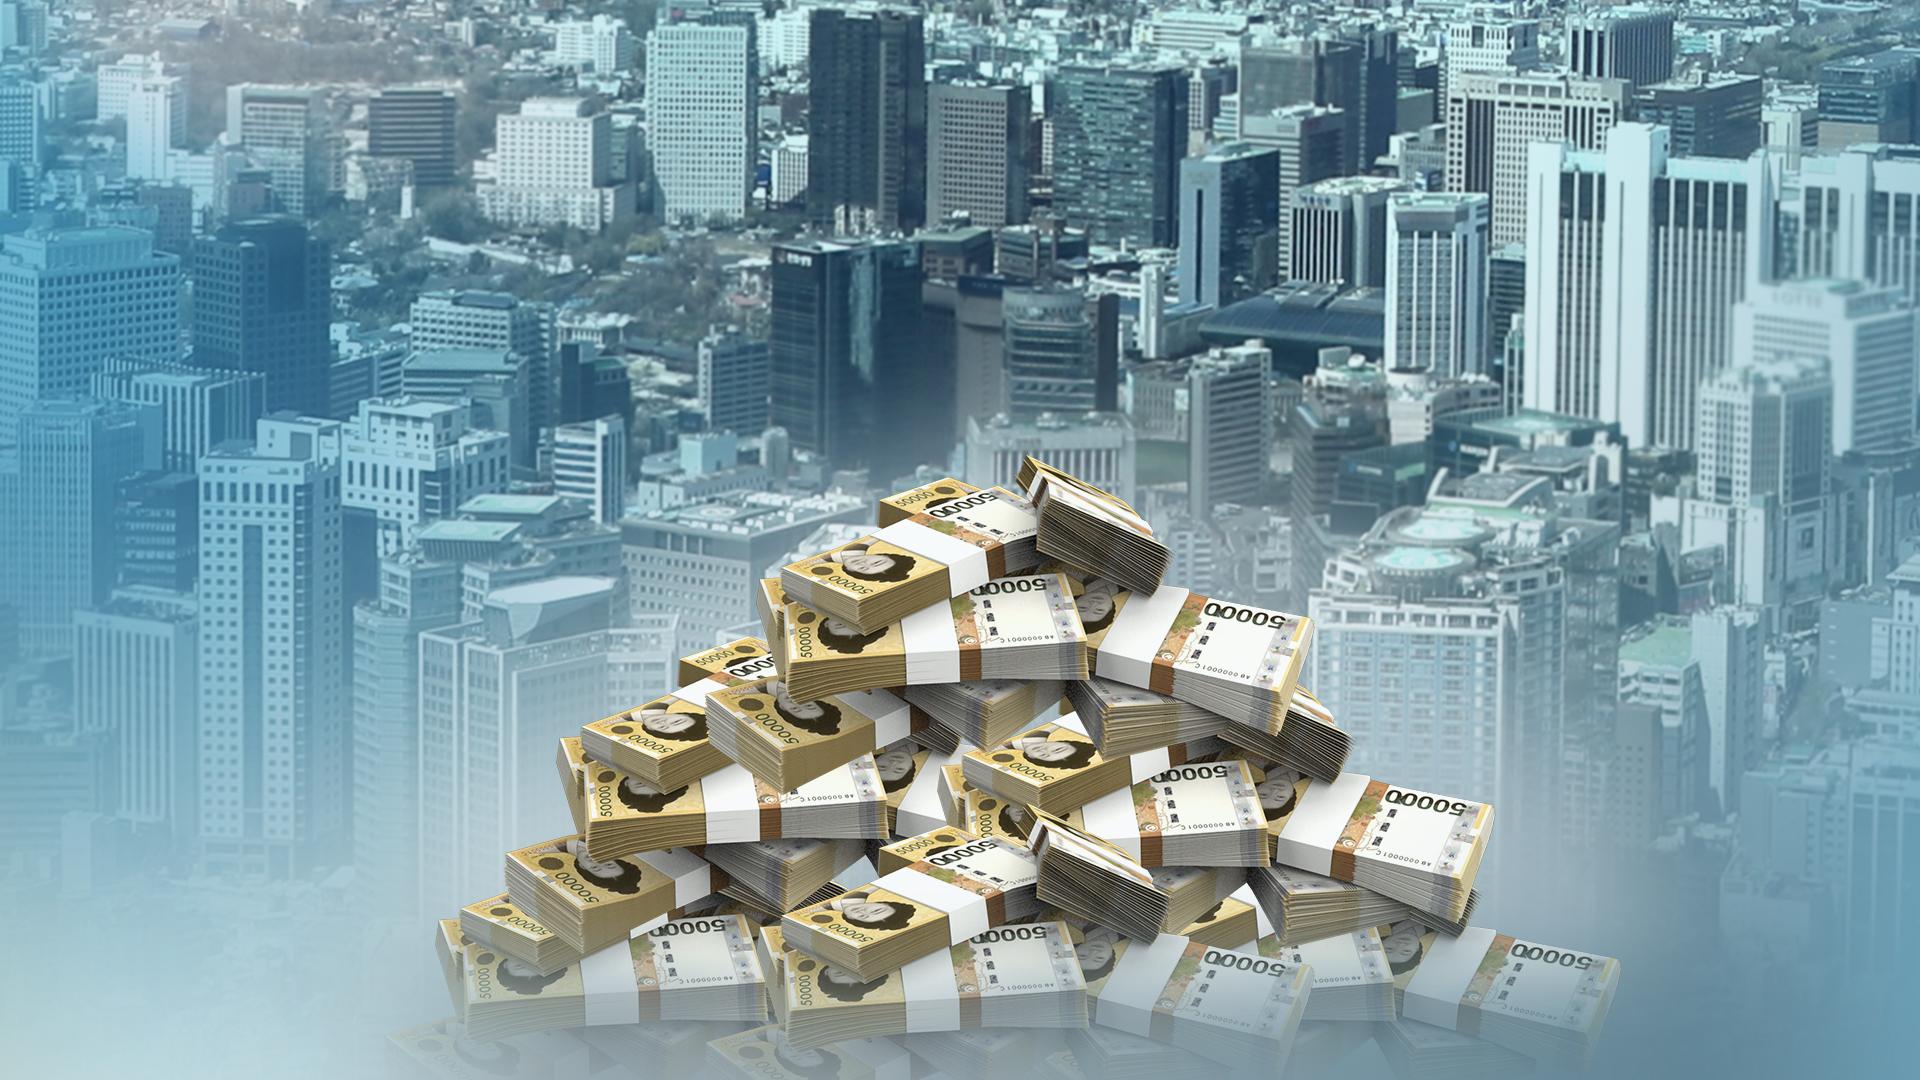 Tax revenue up 8.7 tln won in February